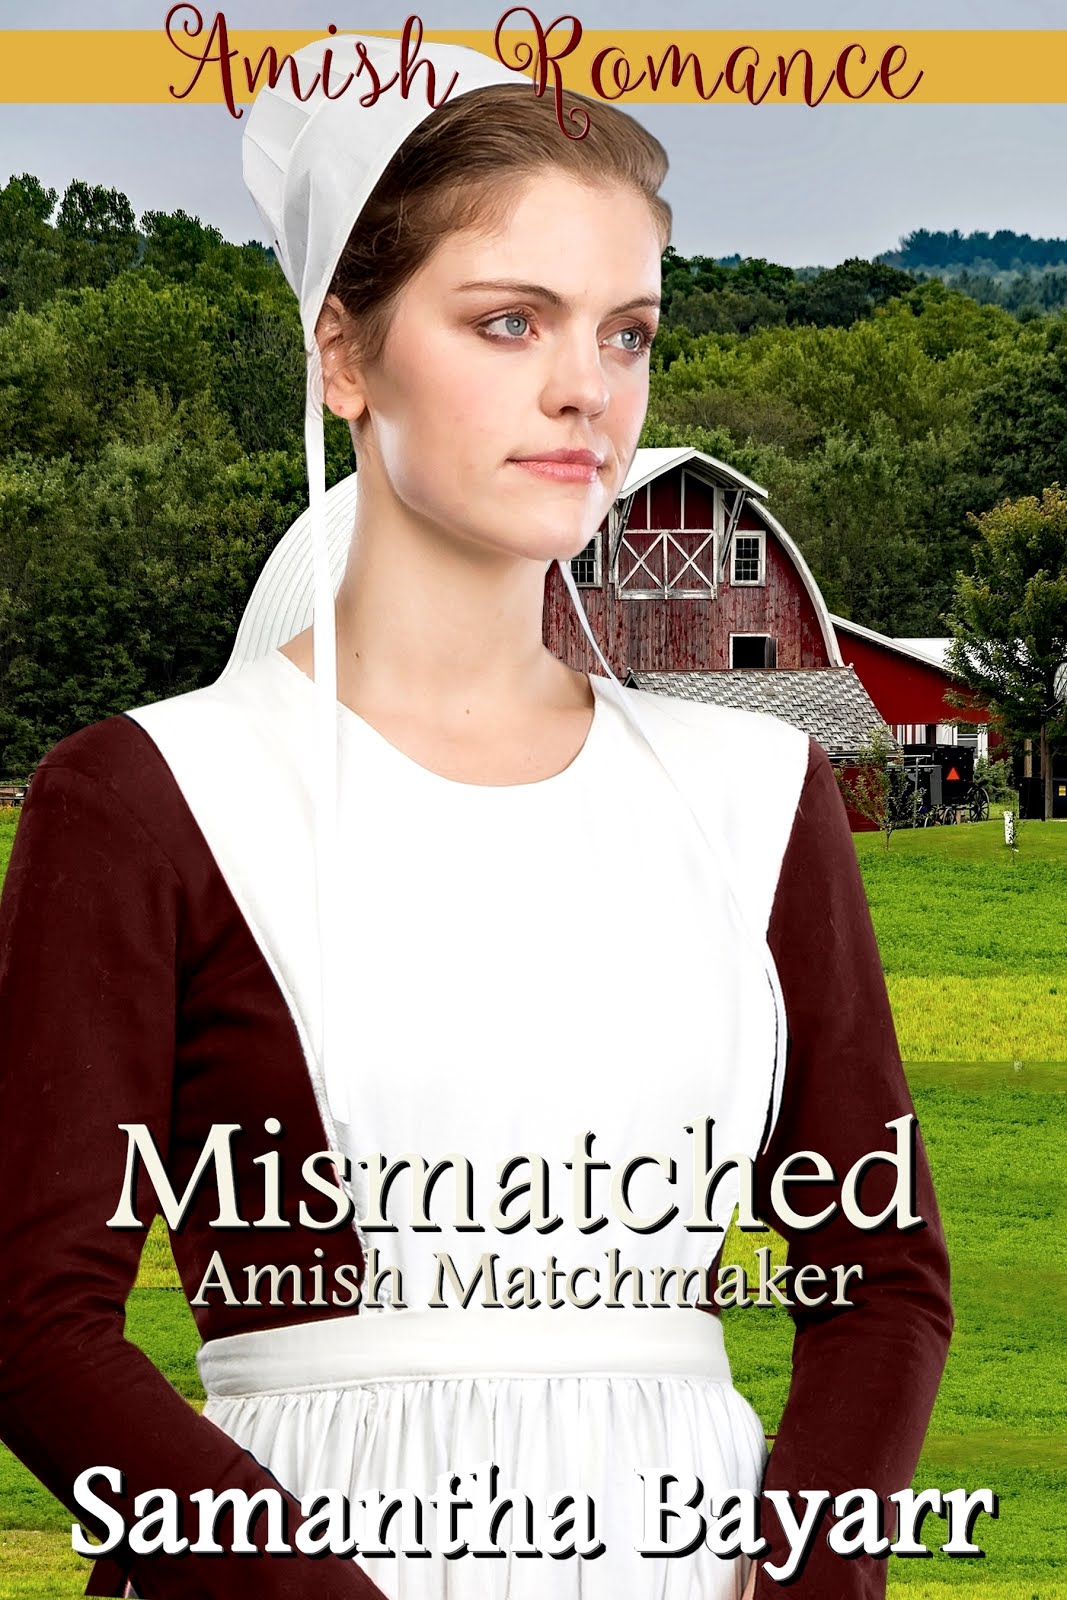 Mismatched: The Amish Matchmaker